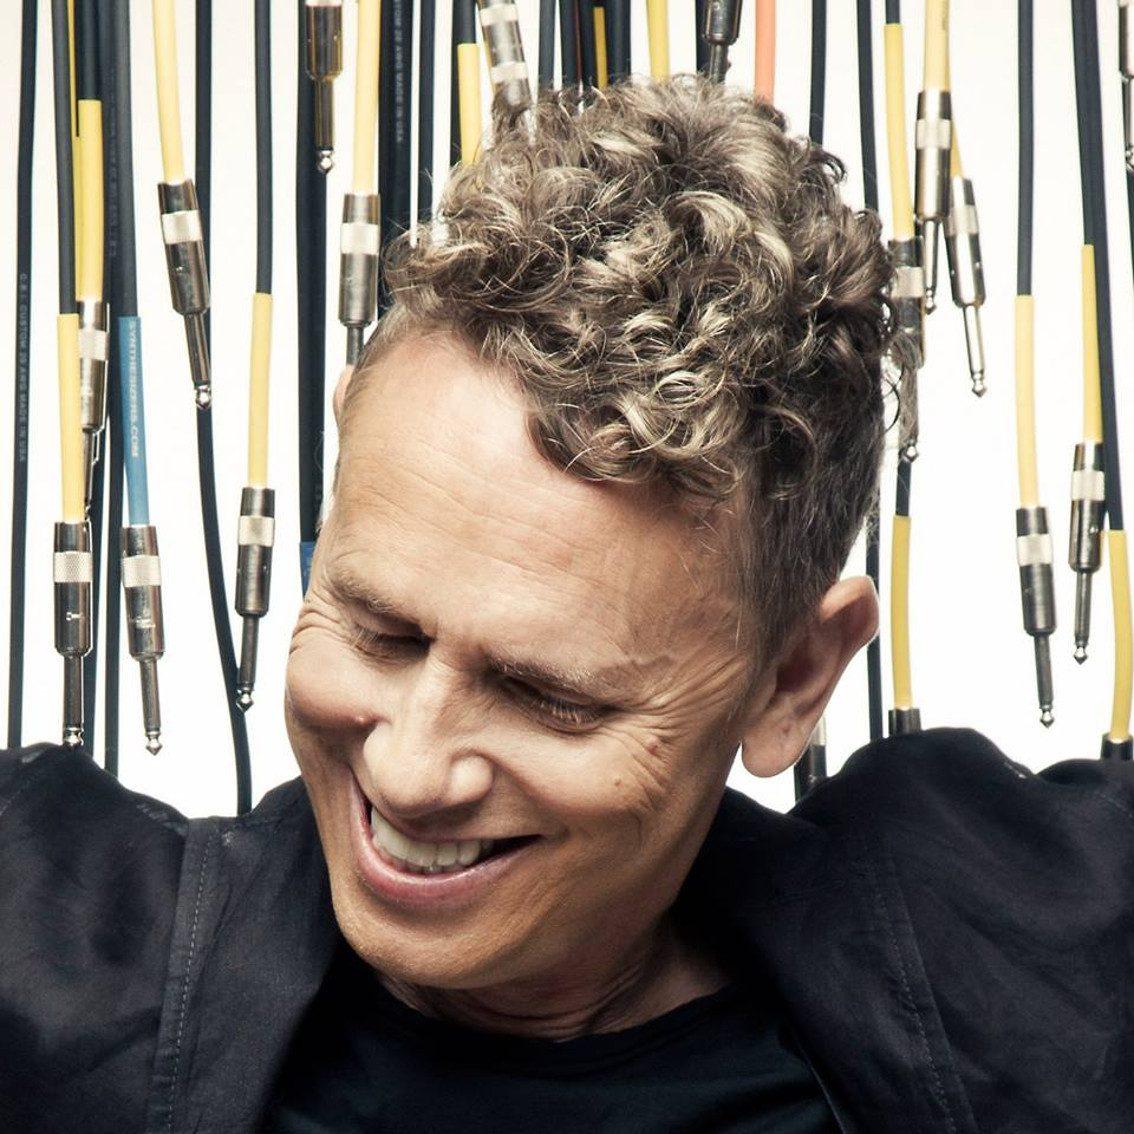 Martin Gore (Depeche Mode) to receive 2019 Moog Innovation Award